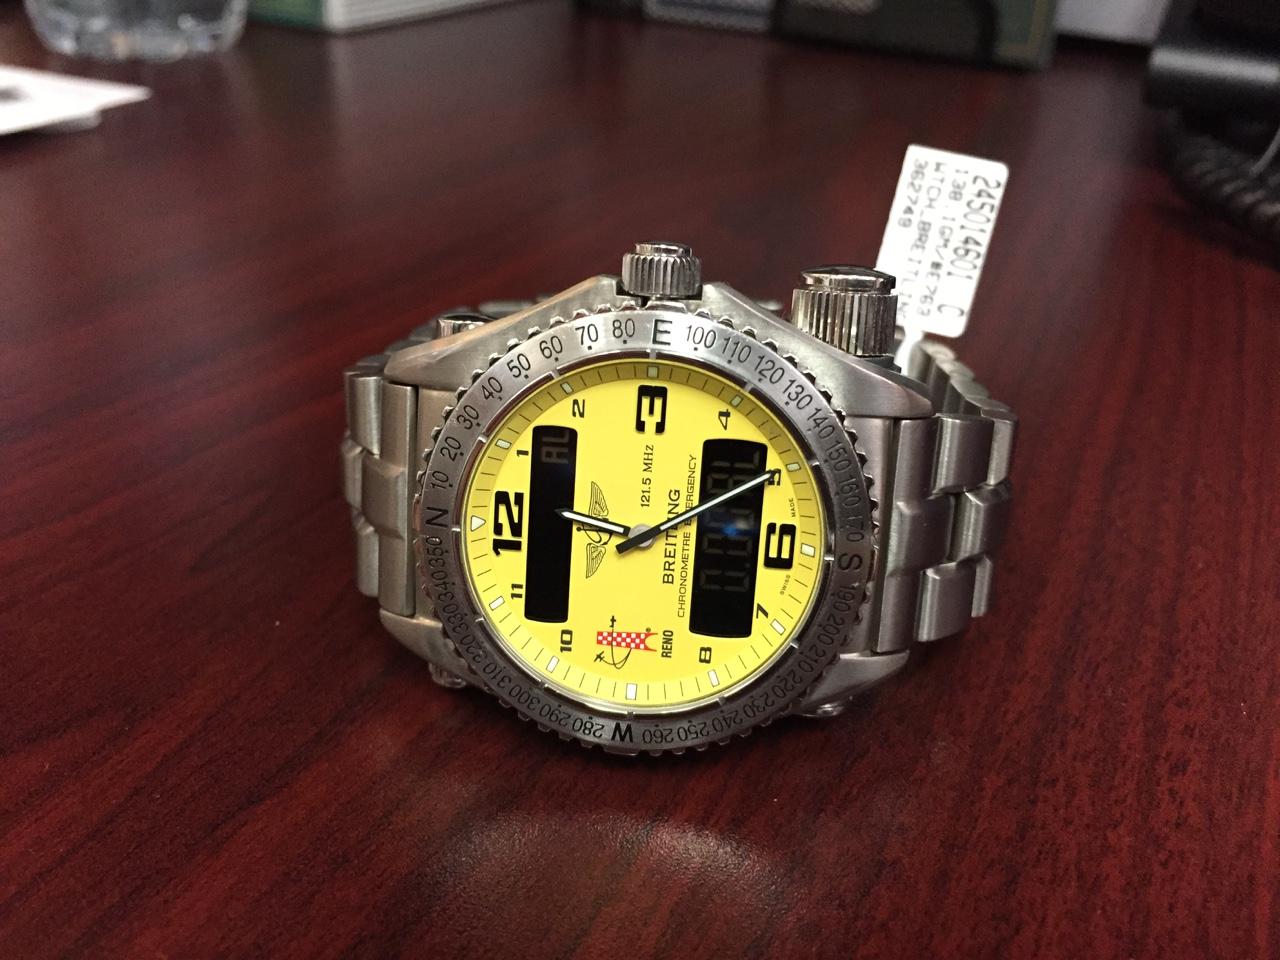 Breitling Emergency Superquartz - $4,000